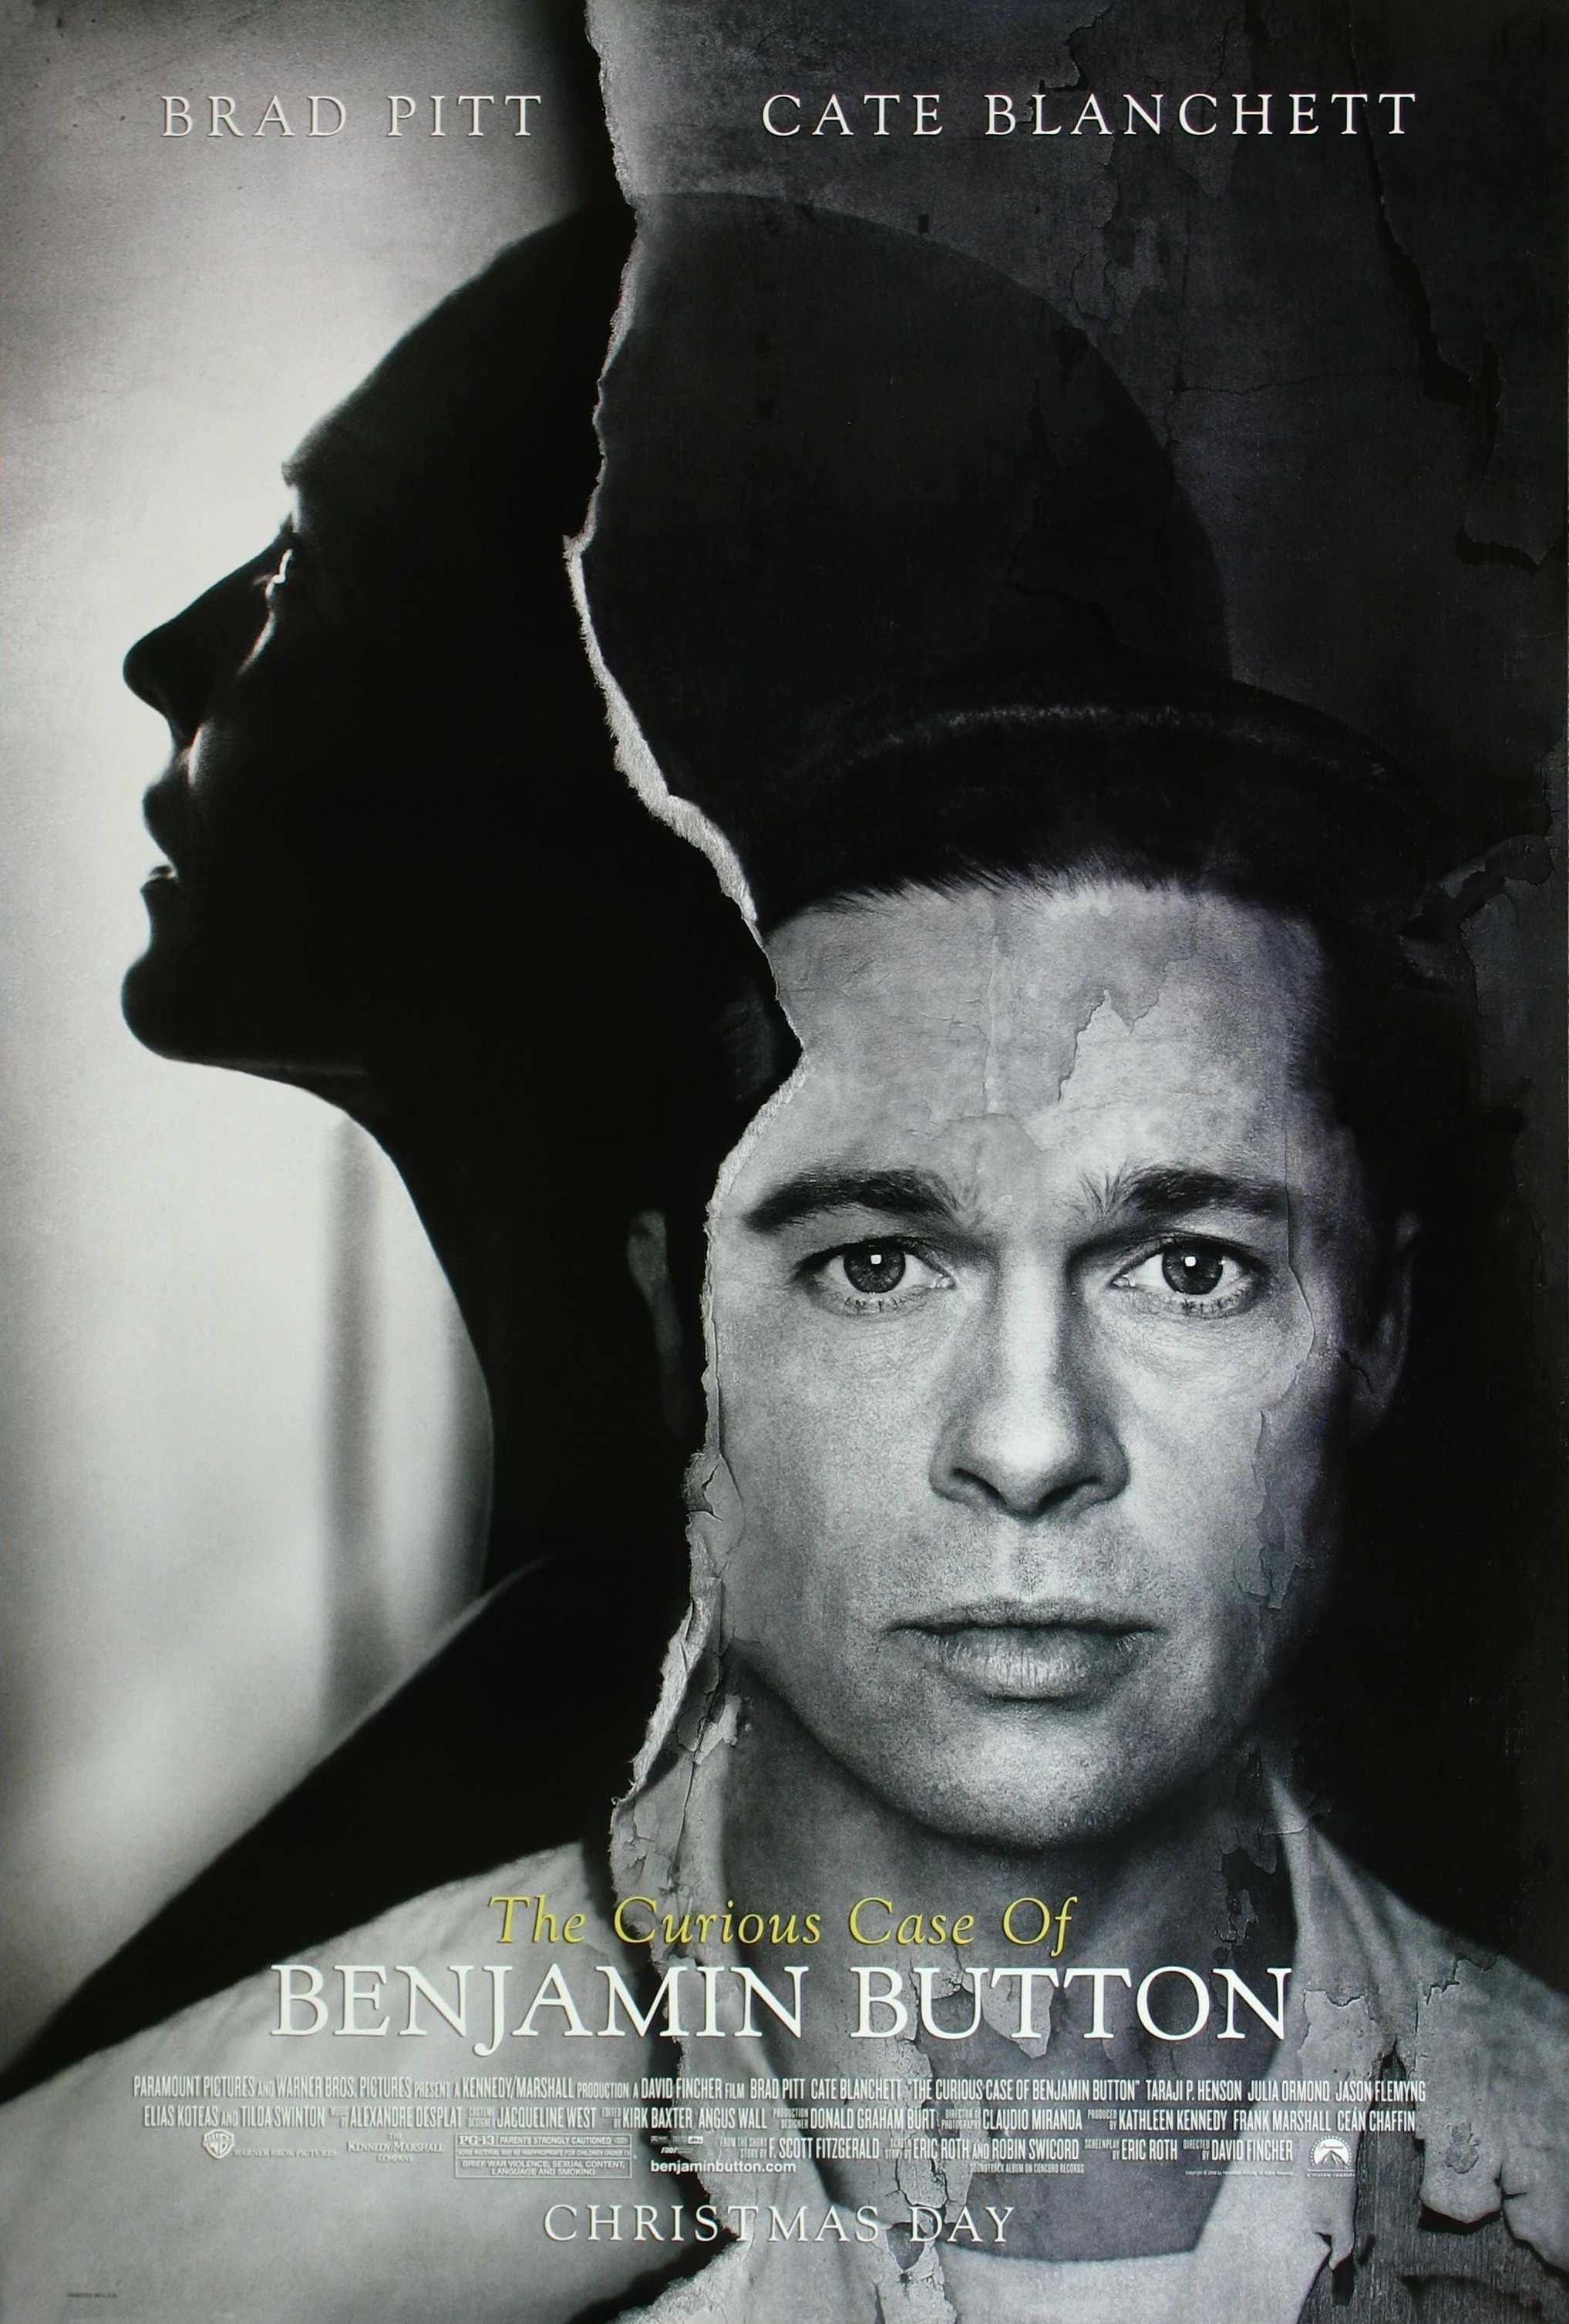 Una Pagina de Cine 2008 The curious case of Benjamin ...